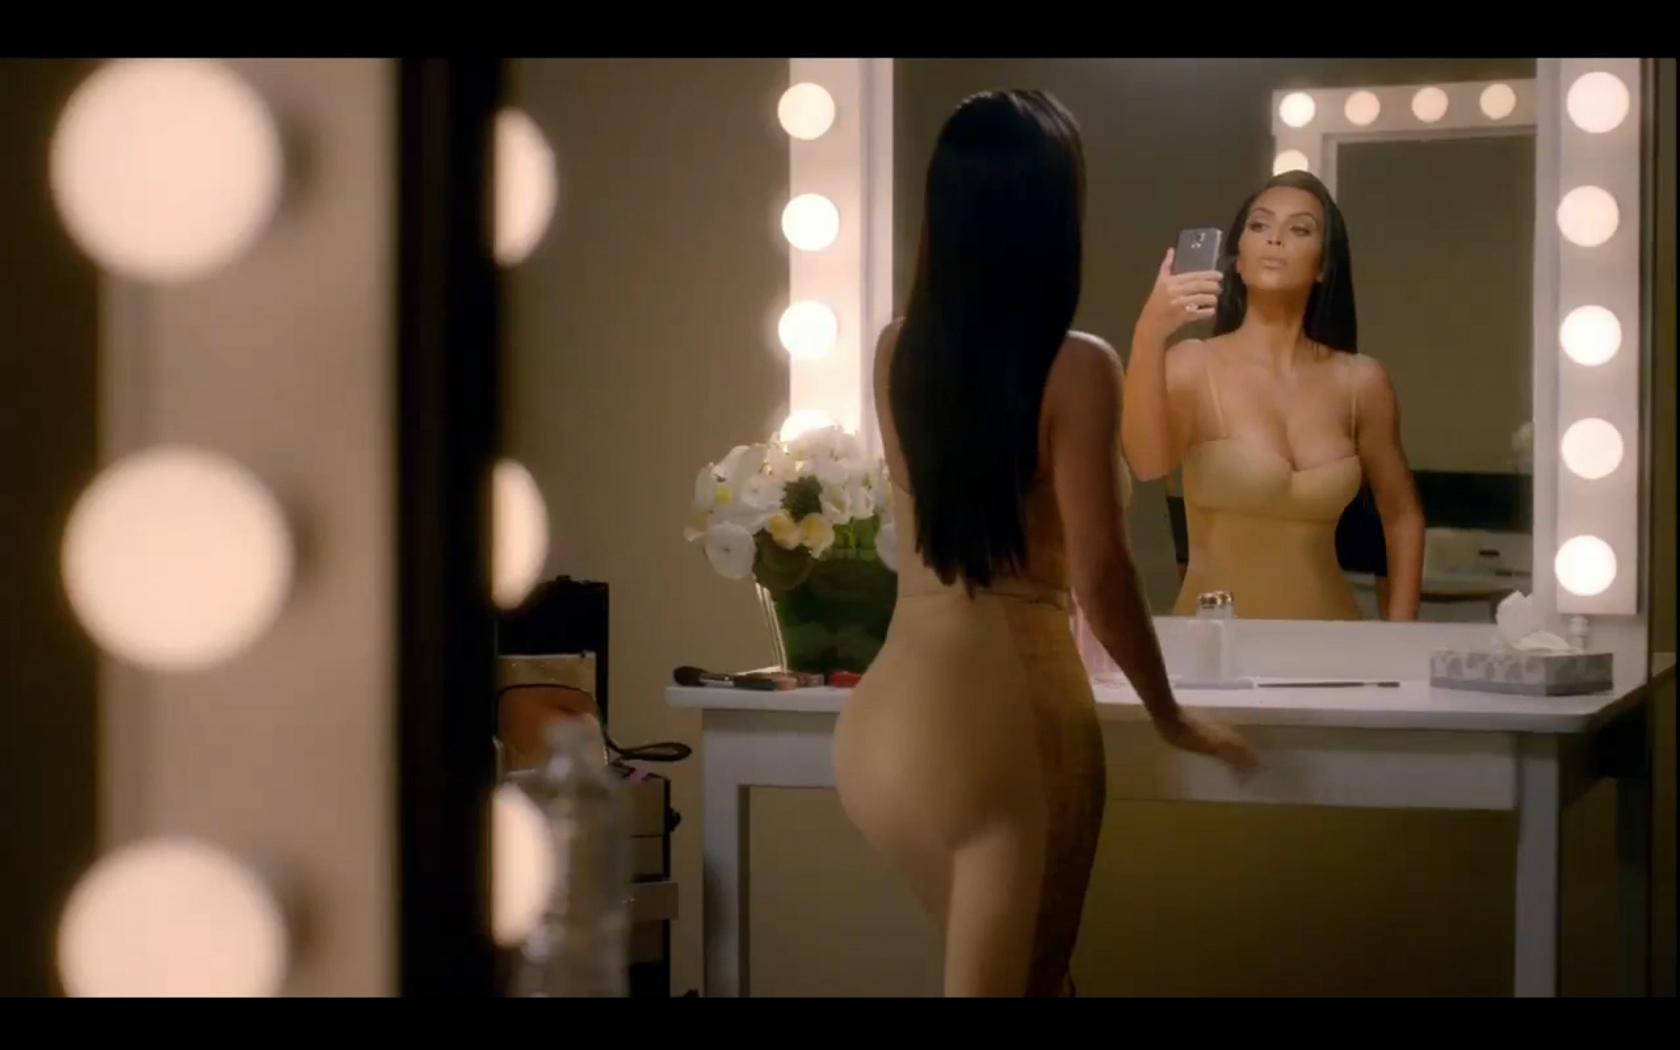 Kim Kardashian's super bowl commercial still of her in Spanx